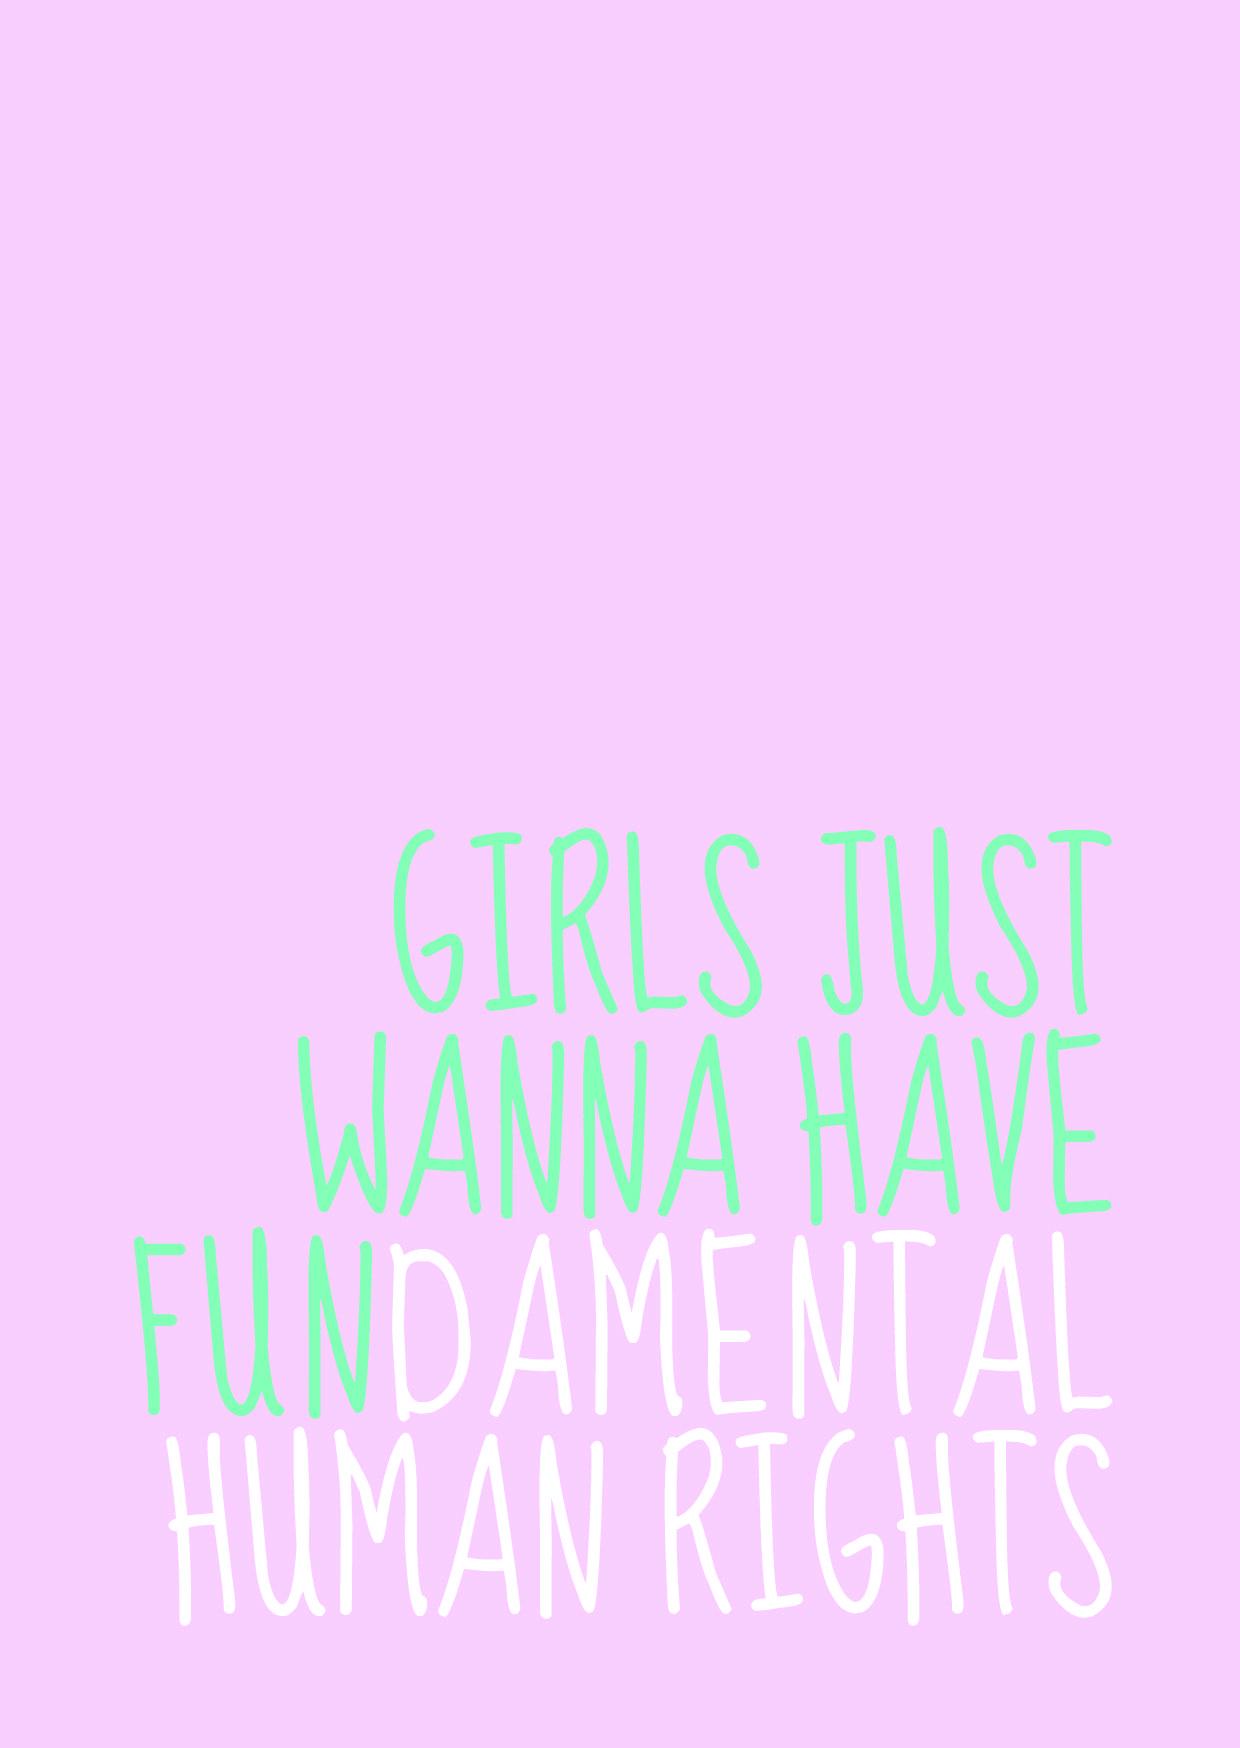 Girls Just Wanna Have Fundamental Human Rights 2016 Quick Saves